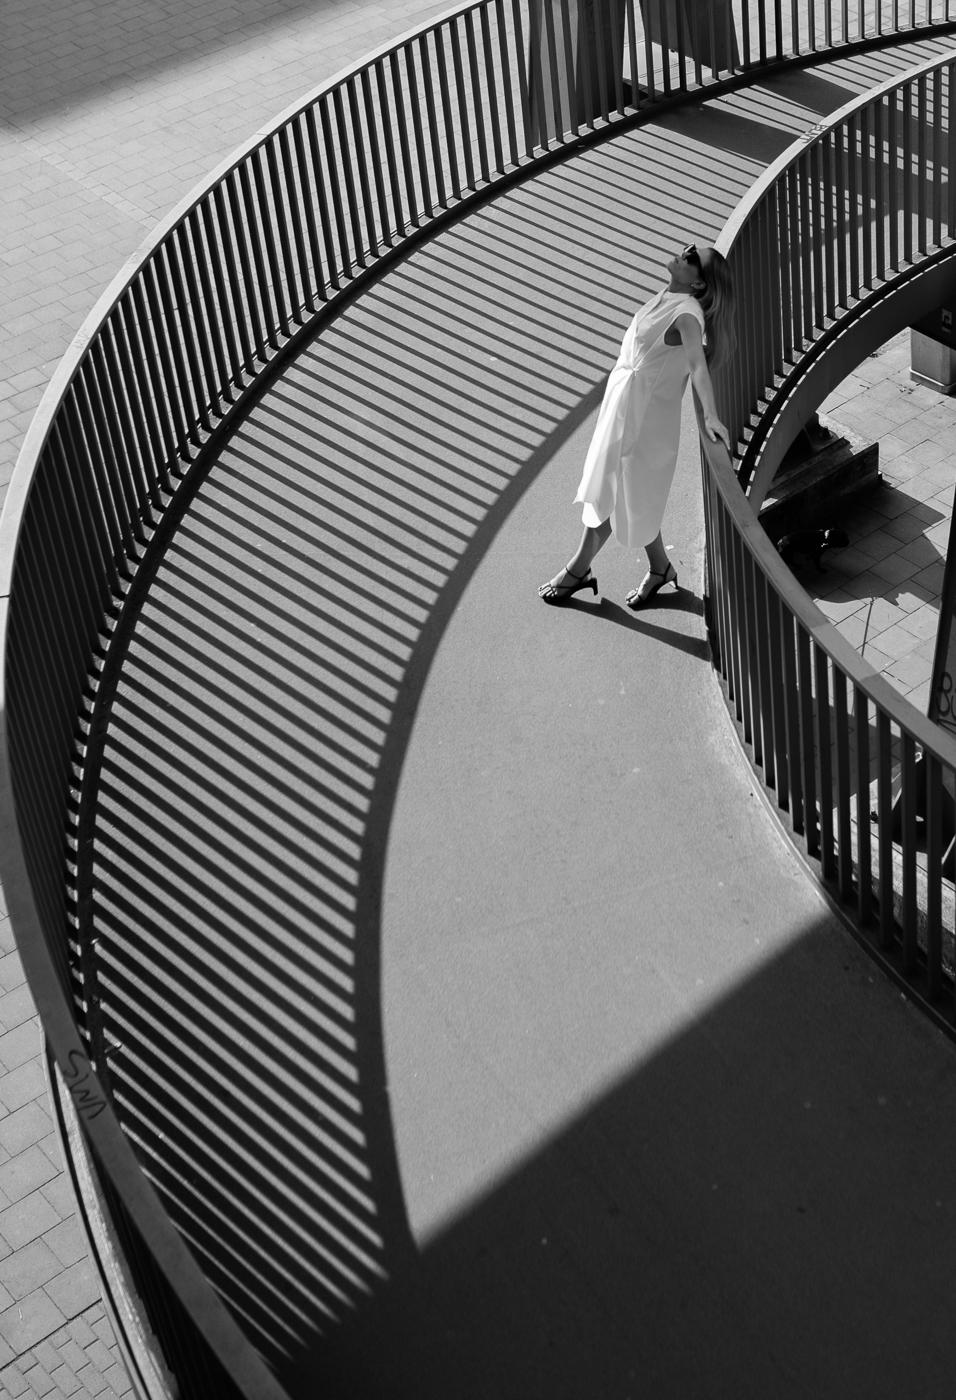 Cos-kleid-sandals-white-dress-8